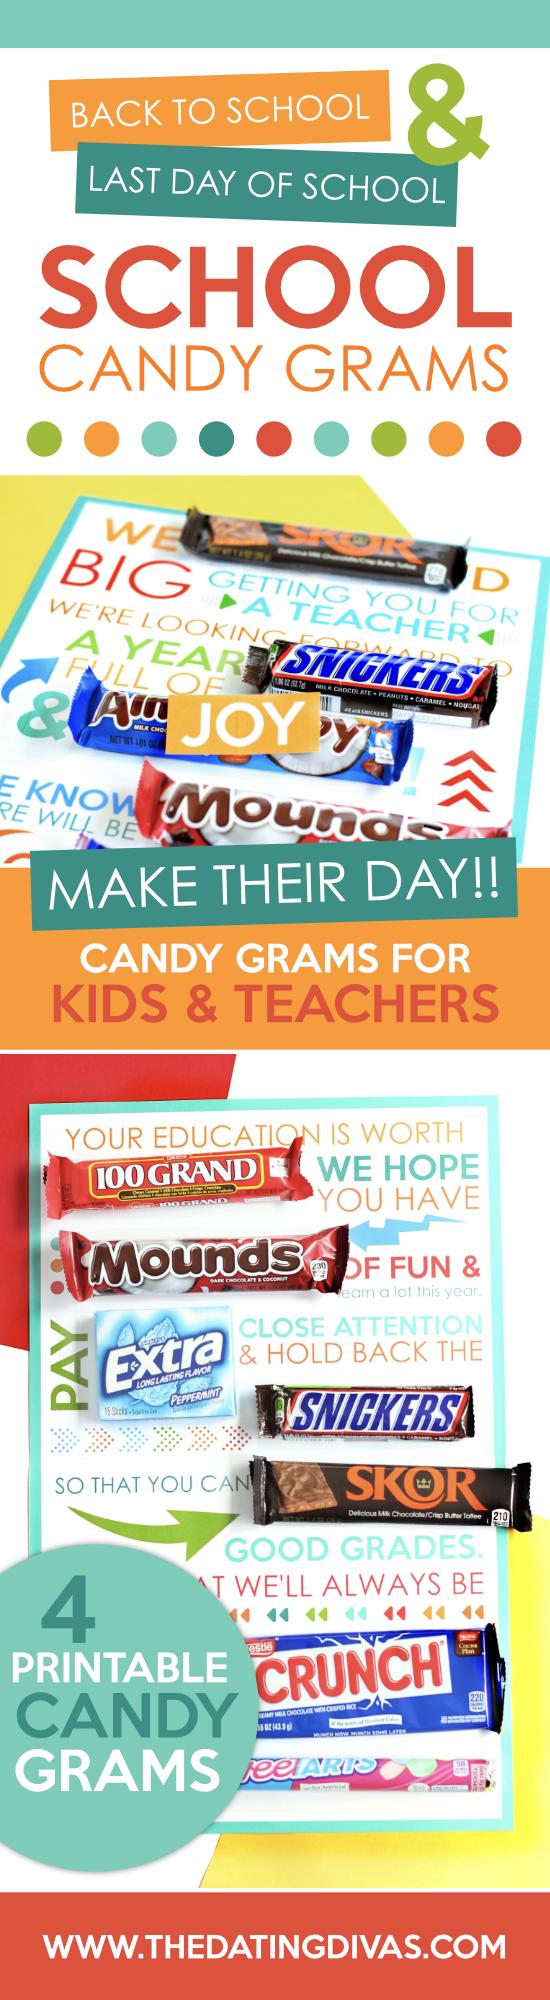 School Candy Gram Ideas for Kids and Teachers #SchoolCandyGram #CandyGramForTeachers